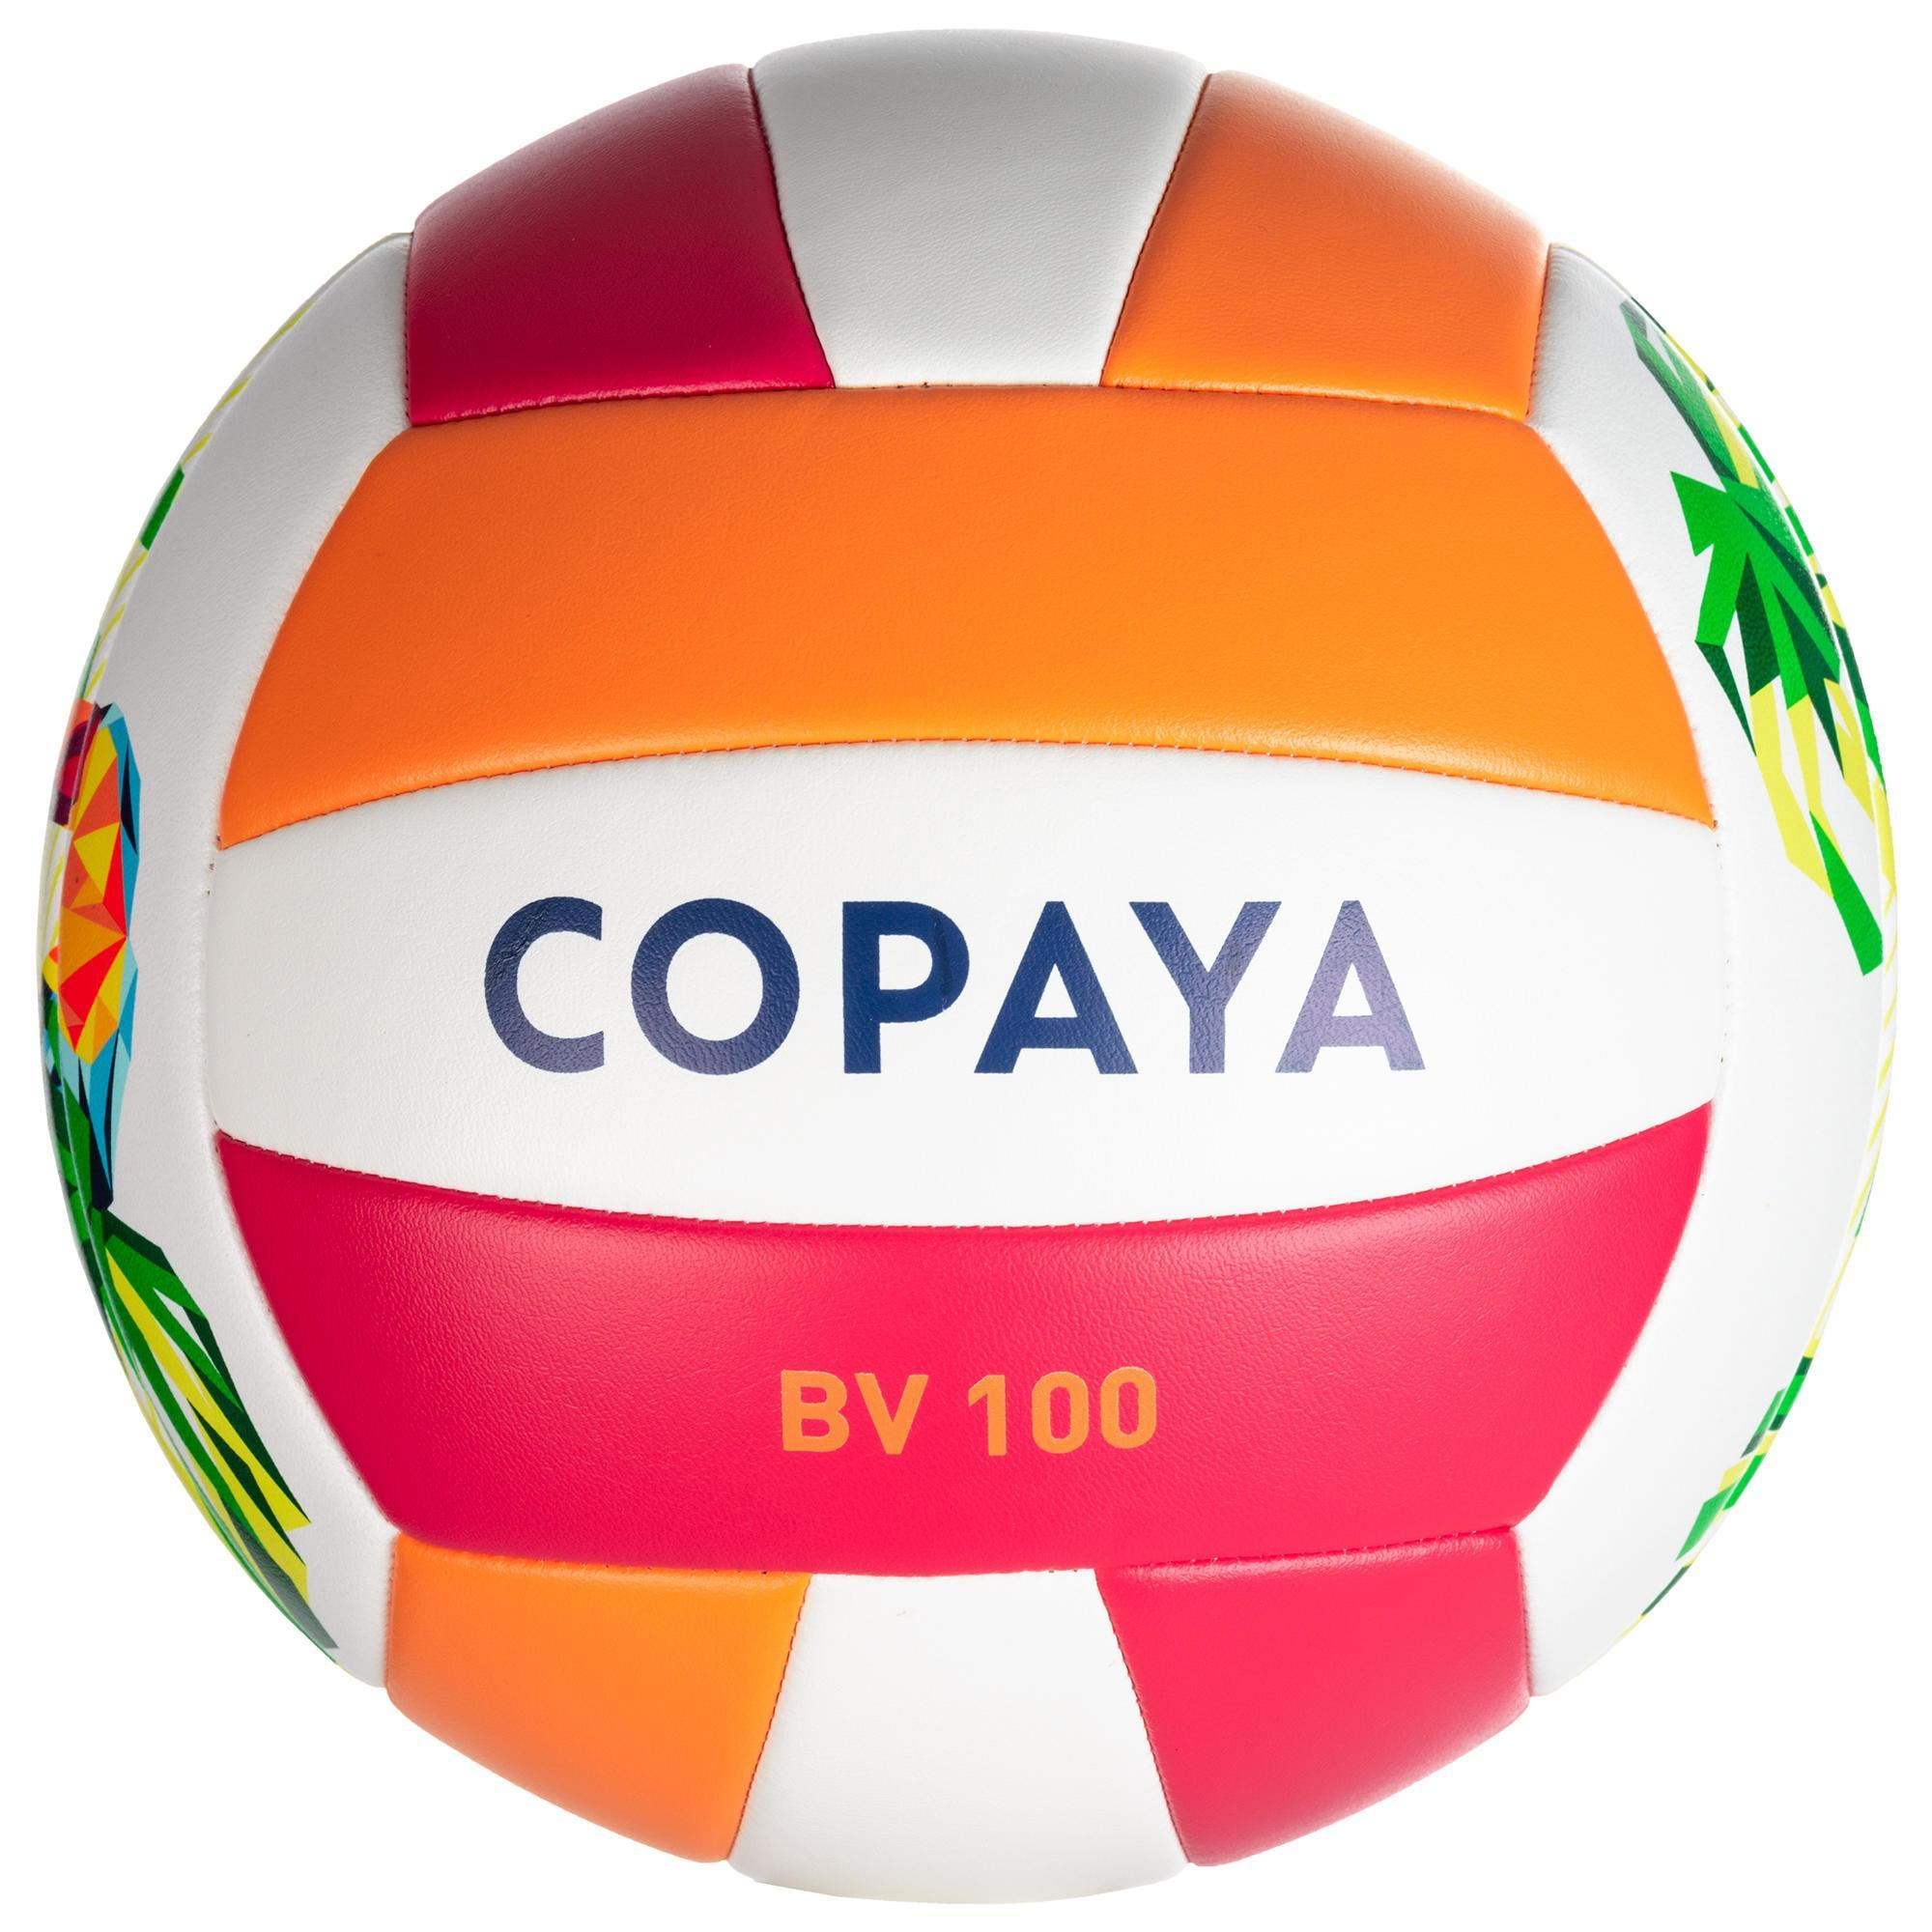 Copaya Beachvolleybal BV100 maat 5